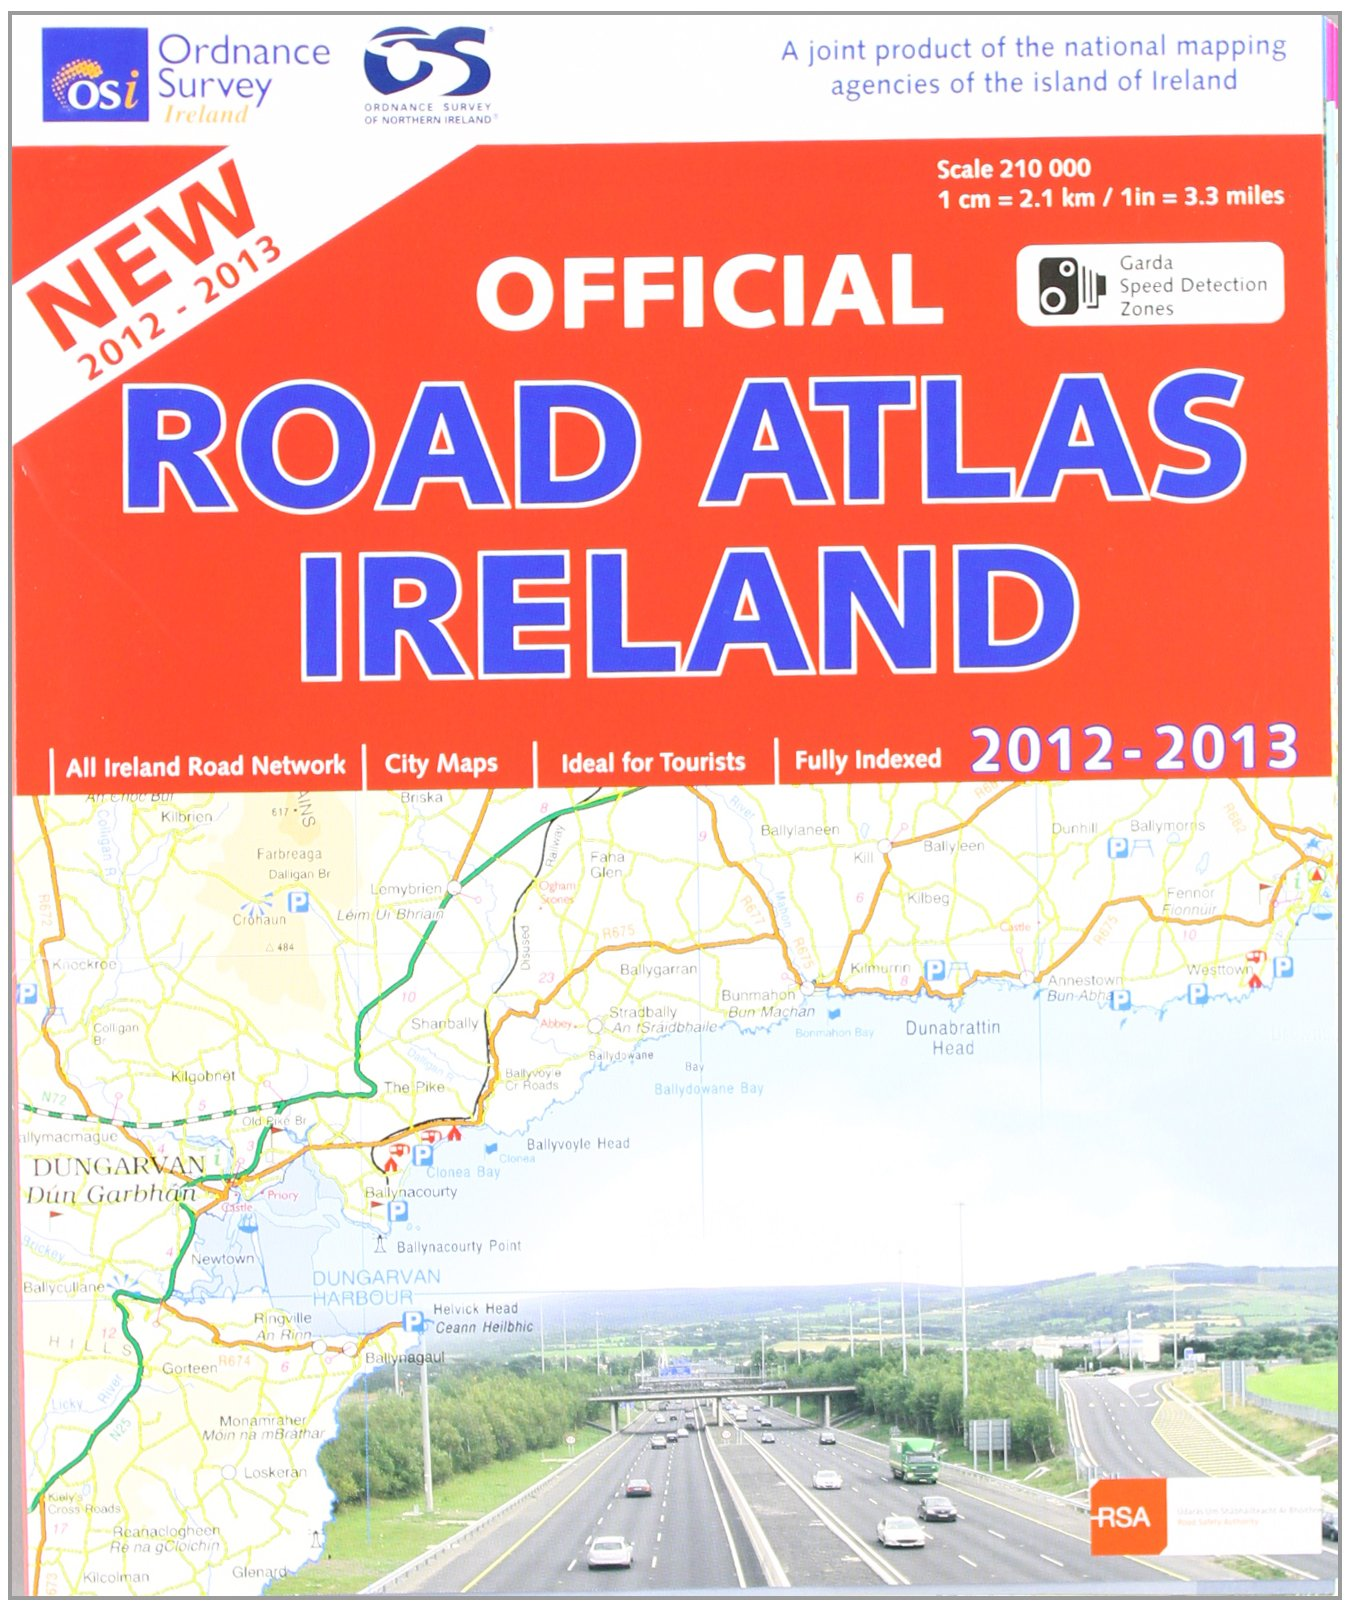 Map Of Ireland Highways.Official Road Atlas Ireland 2012 2013 Ordnance Survey Ireland